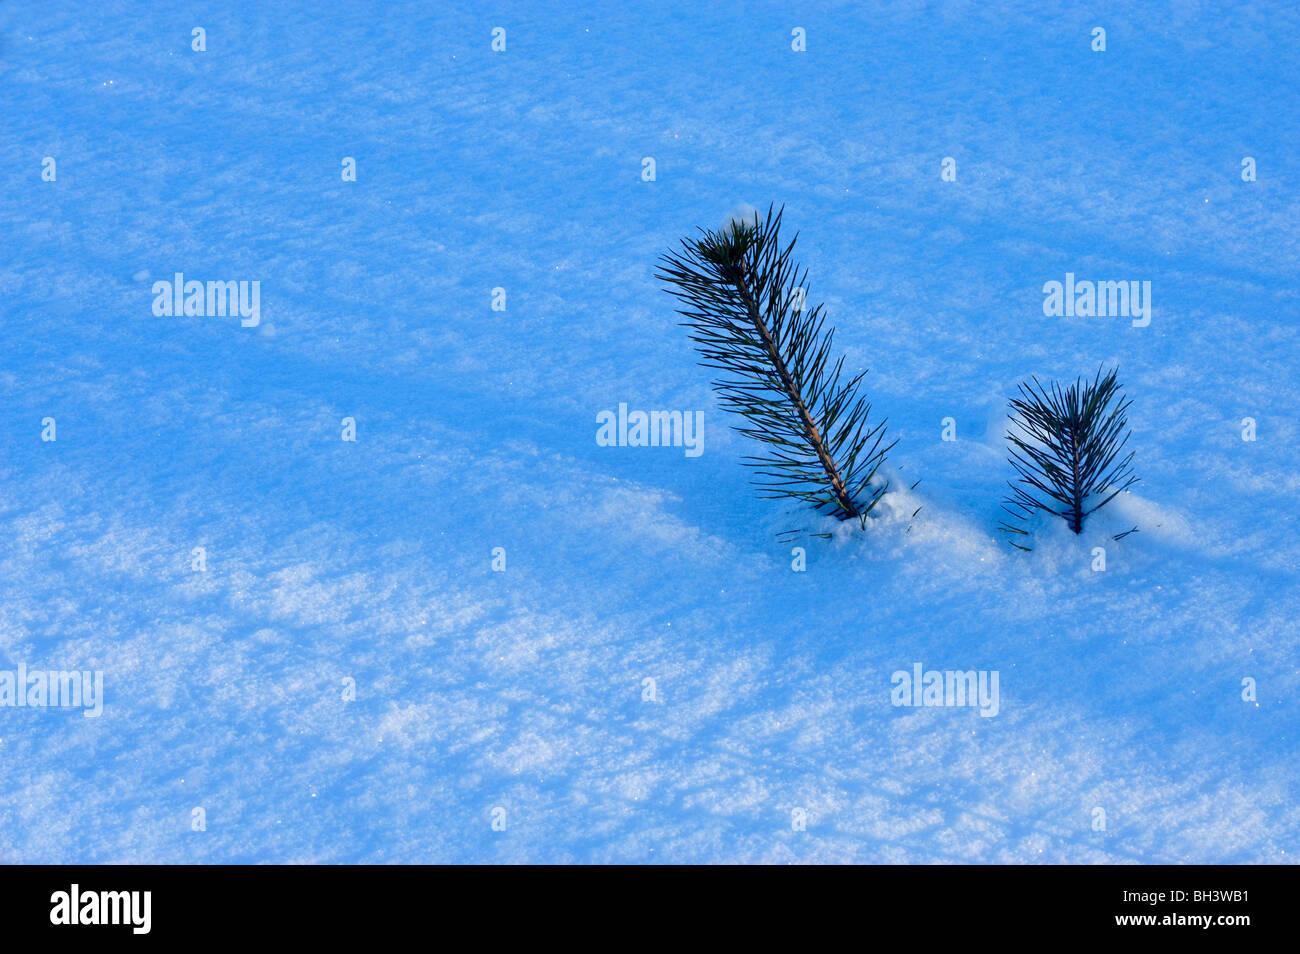 White spruce (Picea glauca) sapling protruding from fresh snow, Greater Sudbury, Ontario, Canada - Stock Image